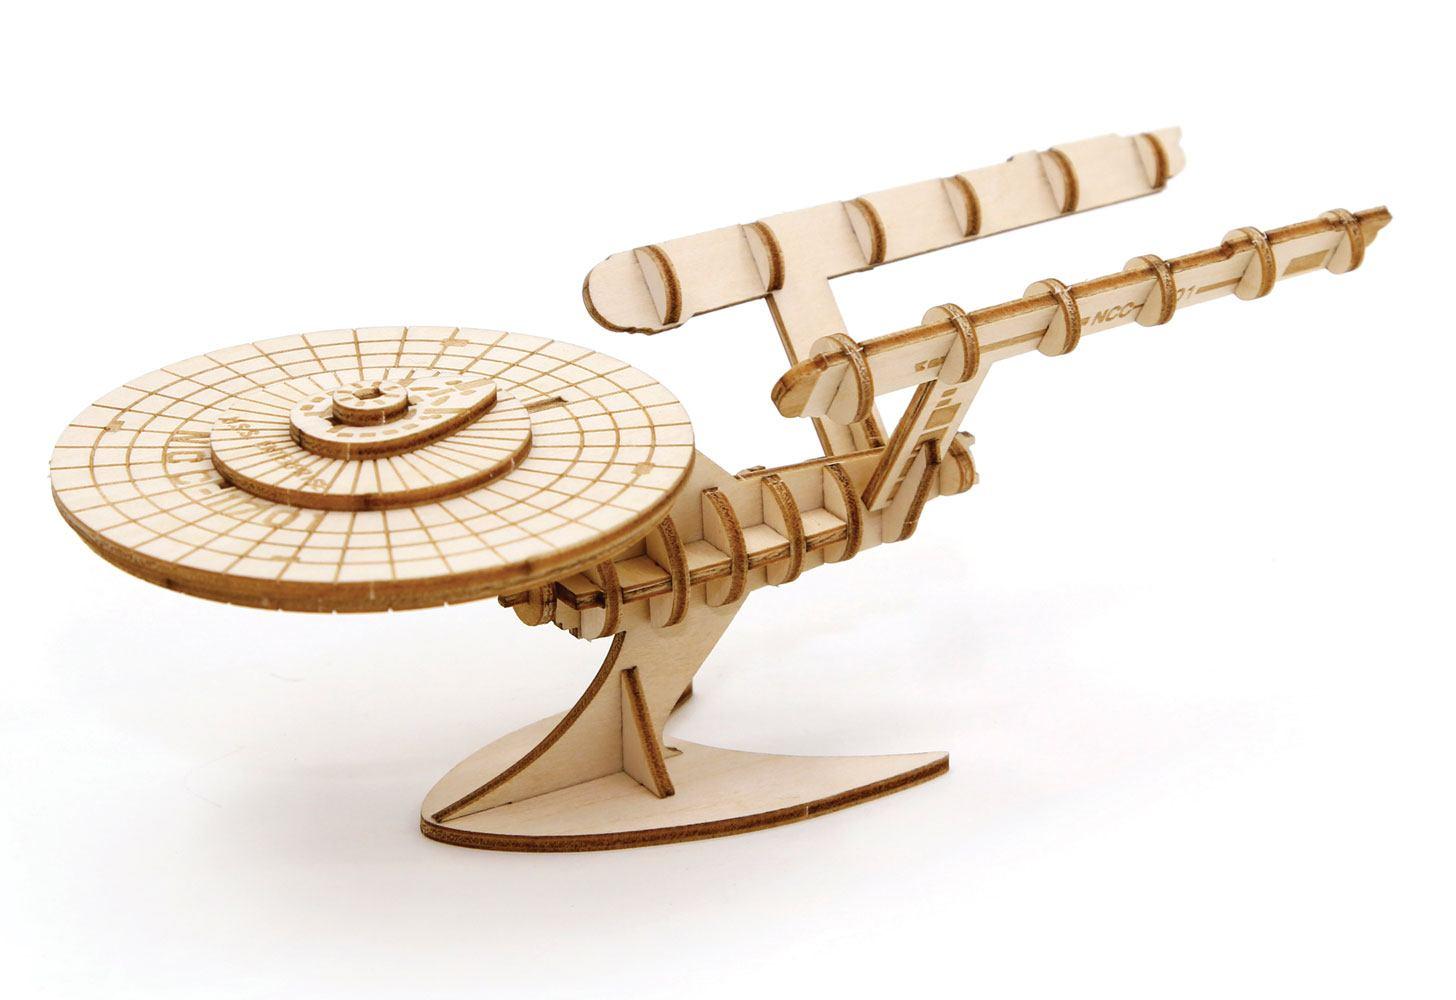 Star Trek TOS IncrediBuilds 3D Wood Model Kit U.S.S. Enterprise